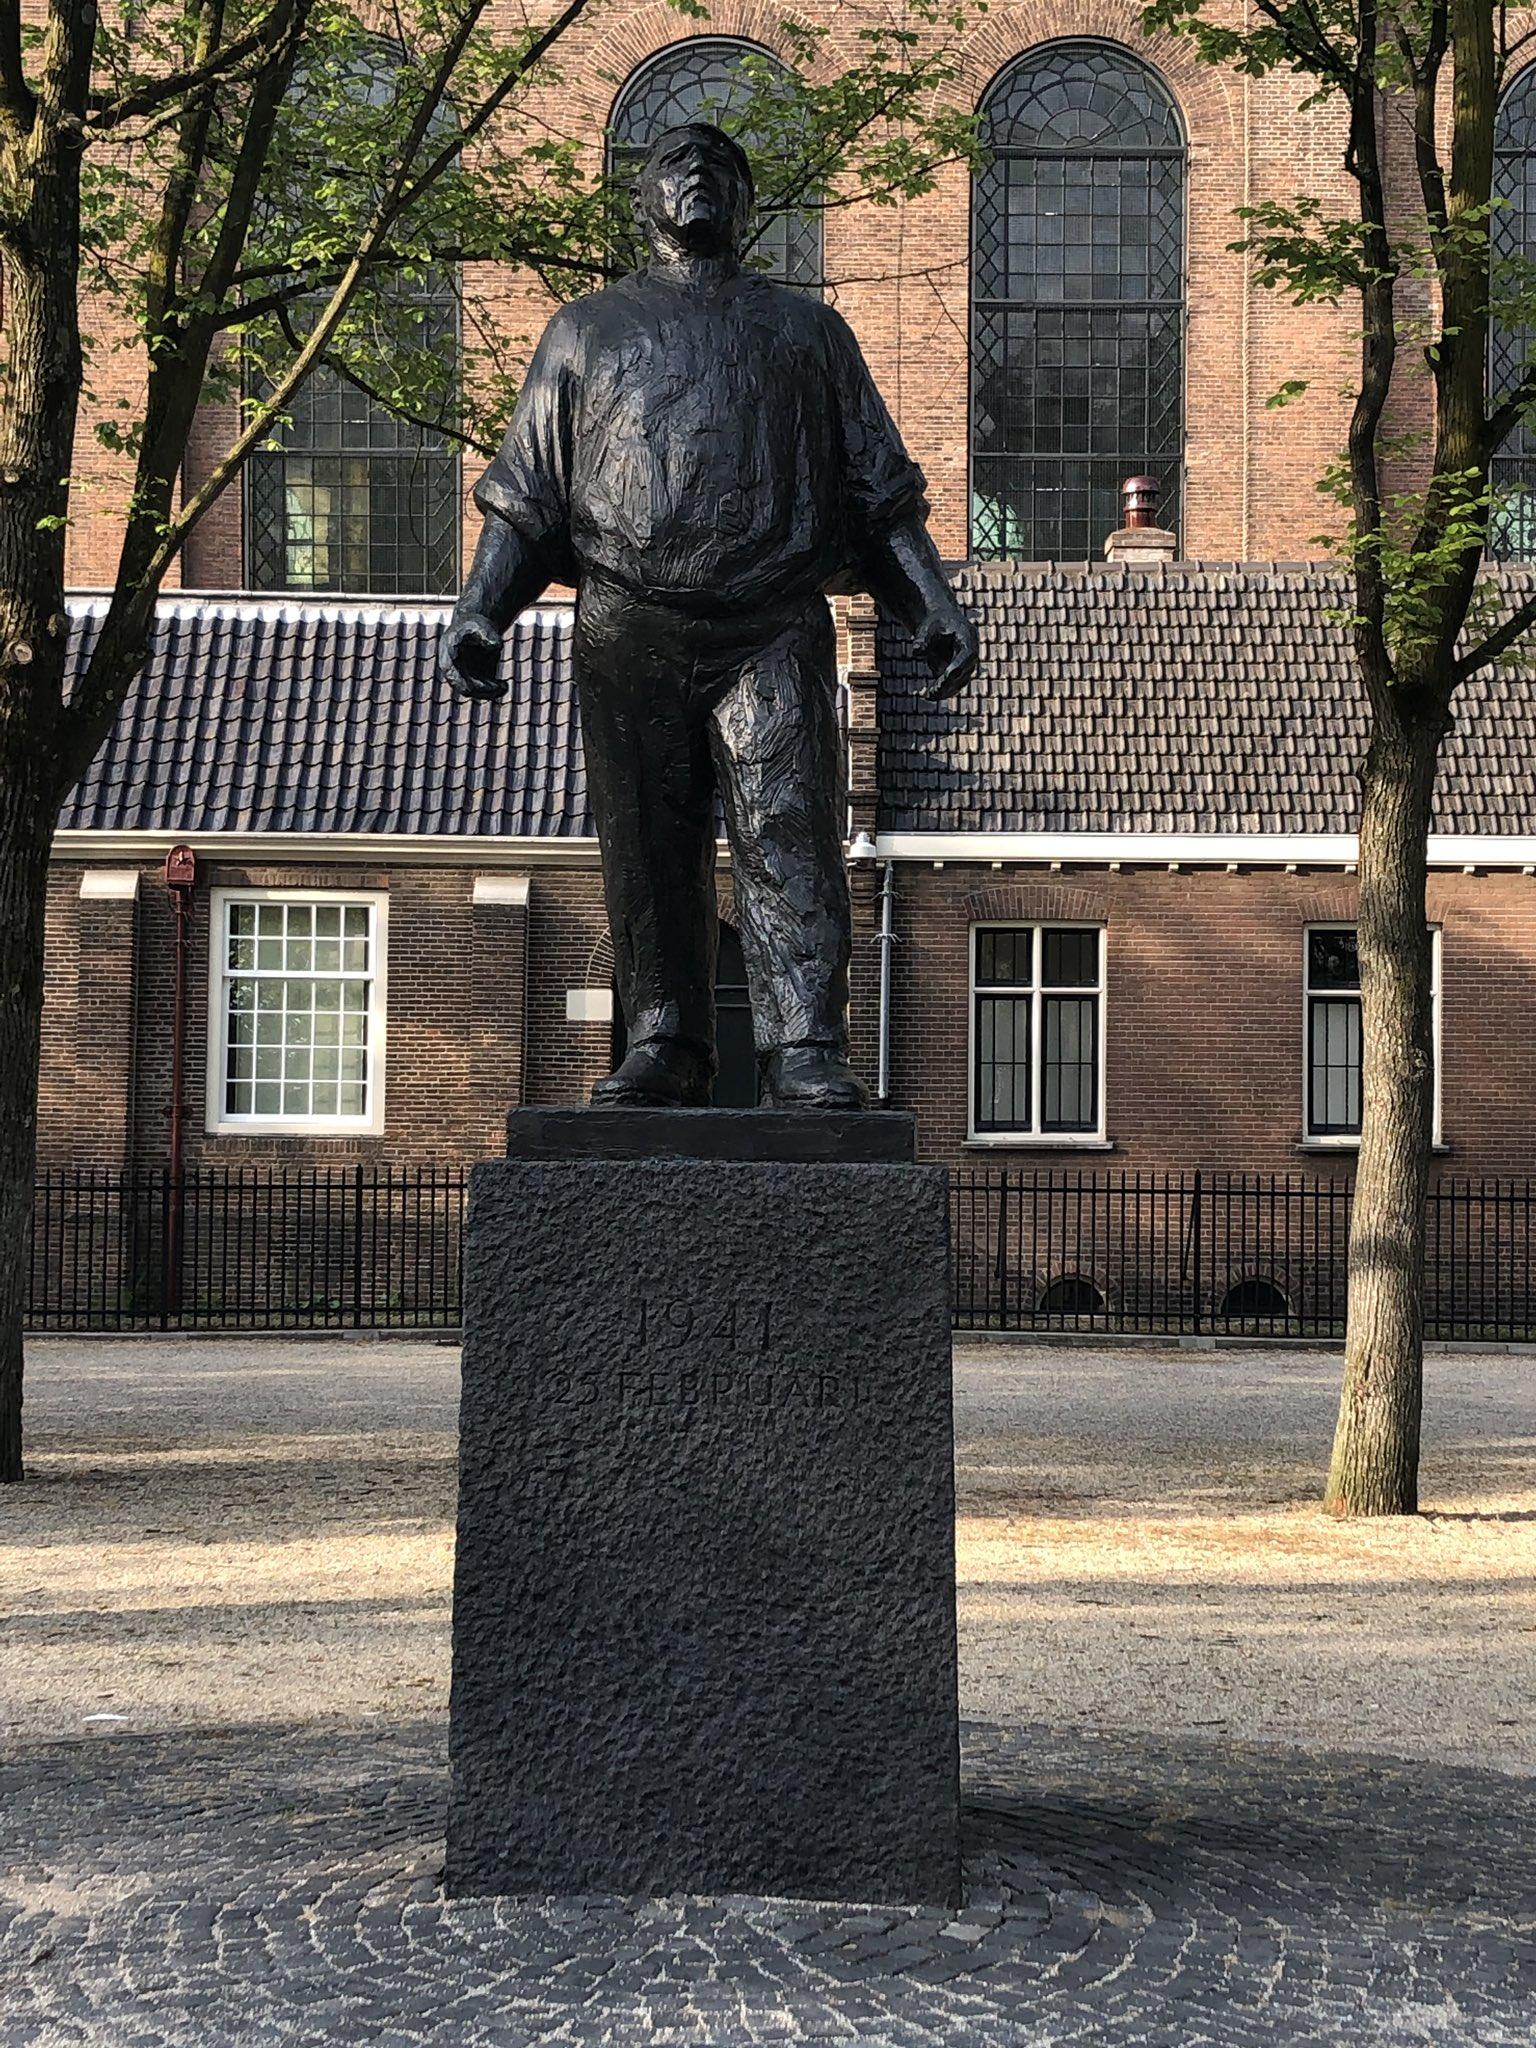 Long live the spirit, strength & solidarity of the #Dokwerker #Amsterdam #Resistance Always against fascism. https://t.co/adTgO9npRq